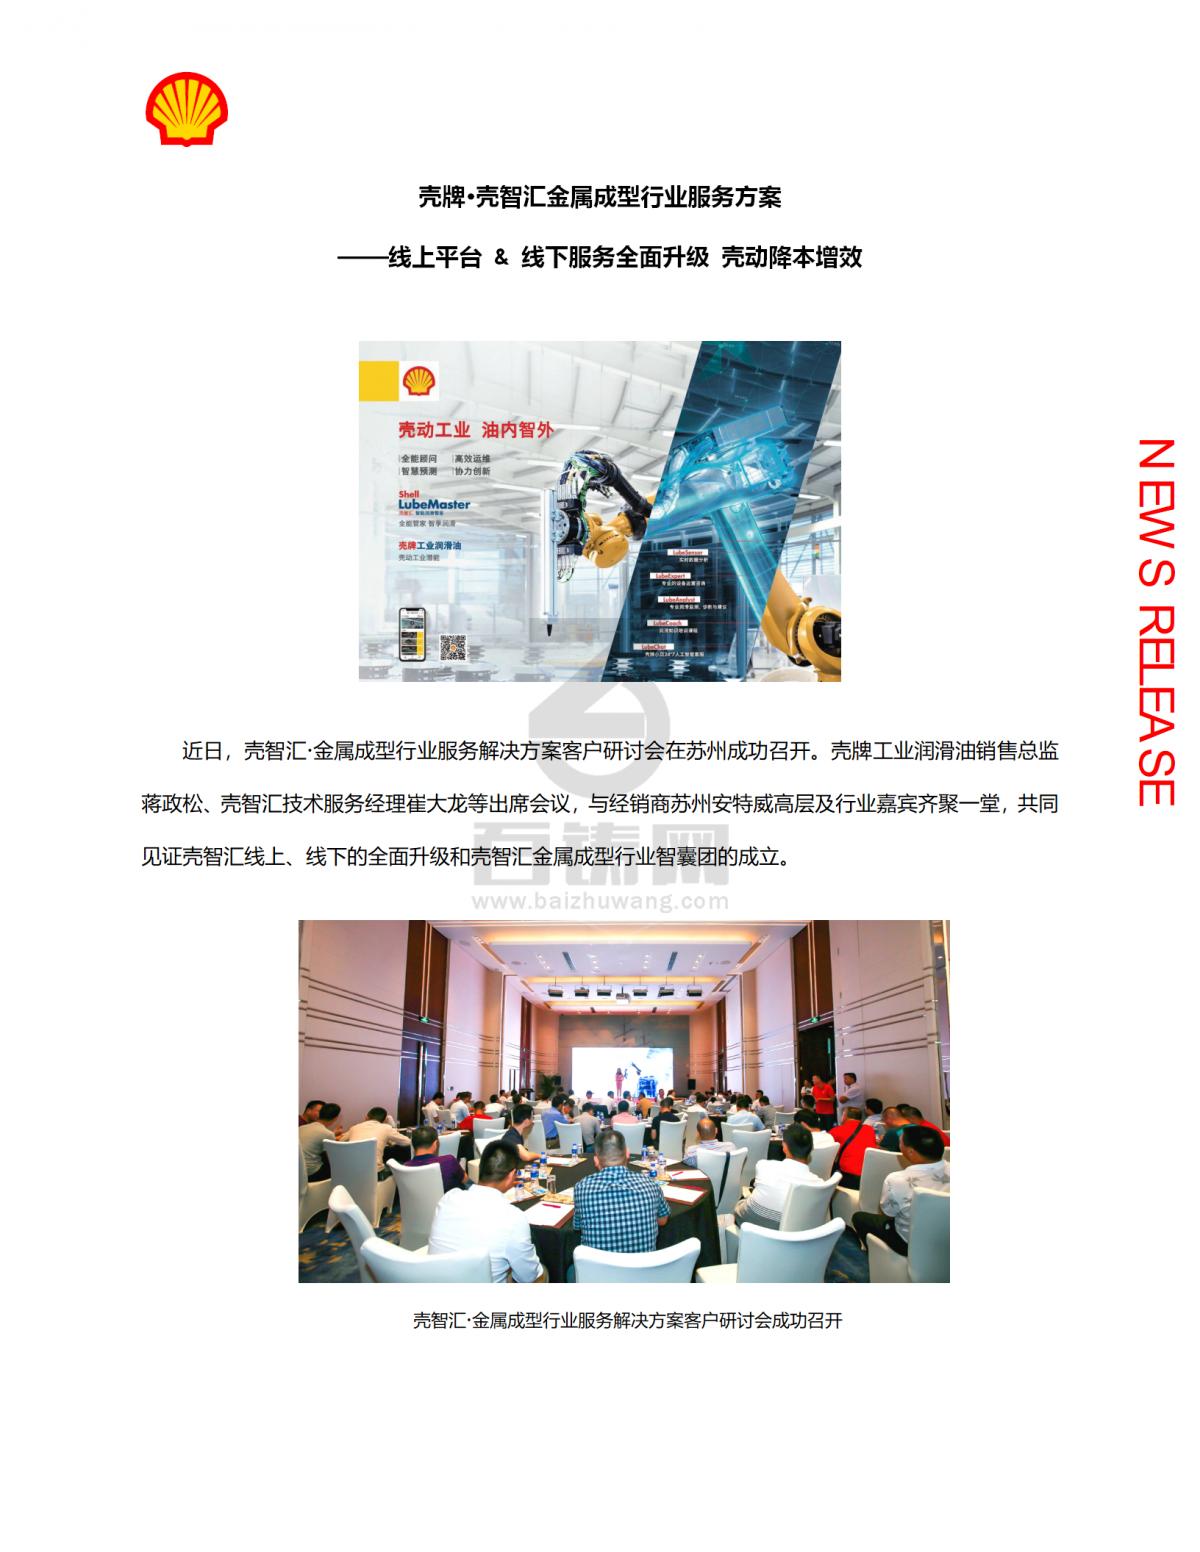 to+网站发布_壳智汇金属成型行业服务解决方案客户研讨会_final_0923_powt_01